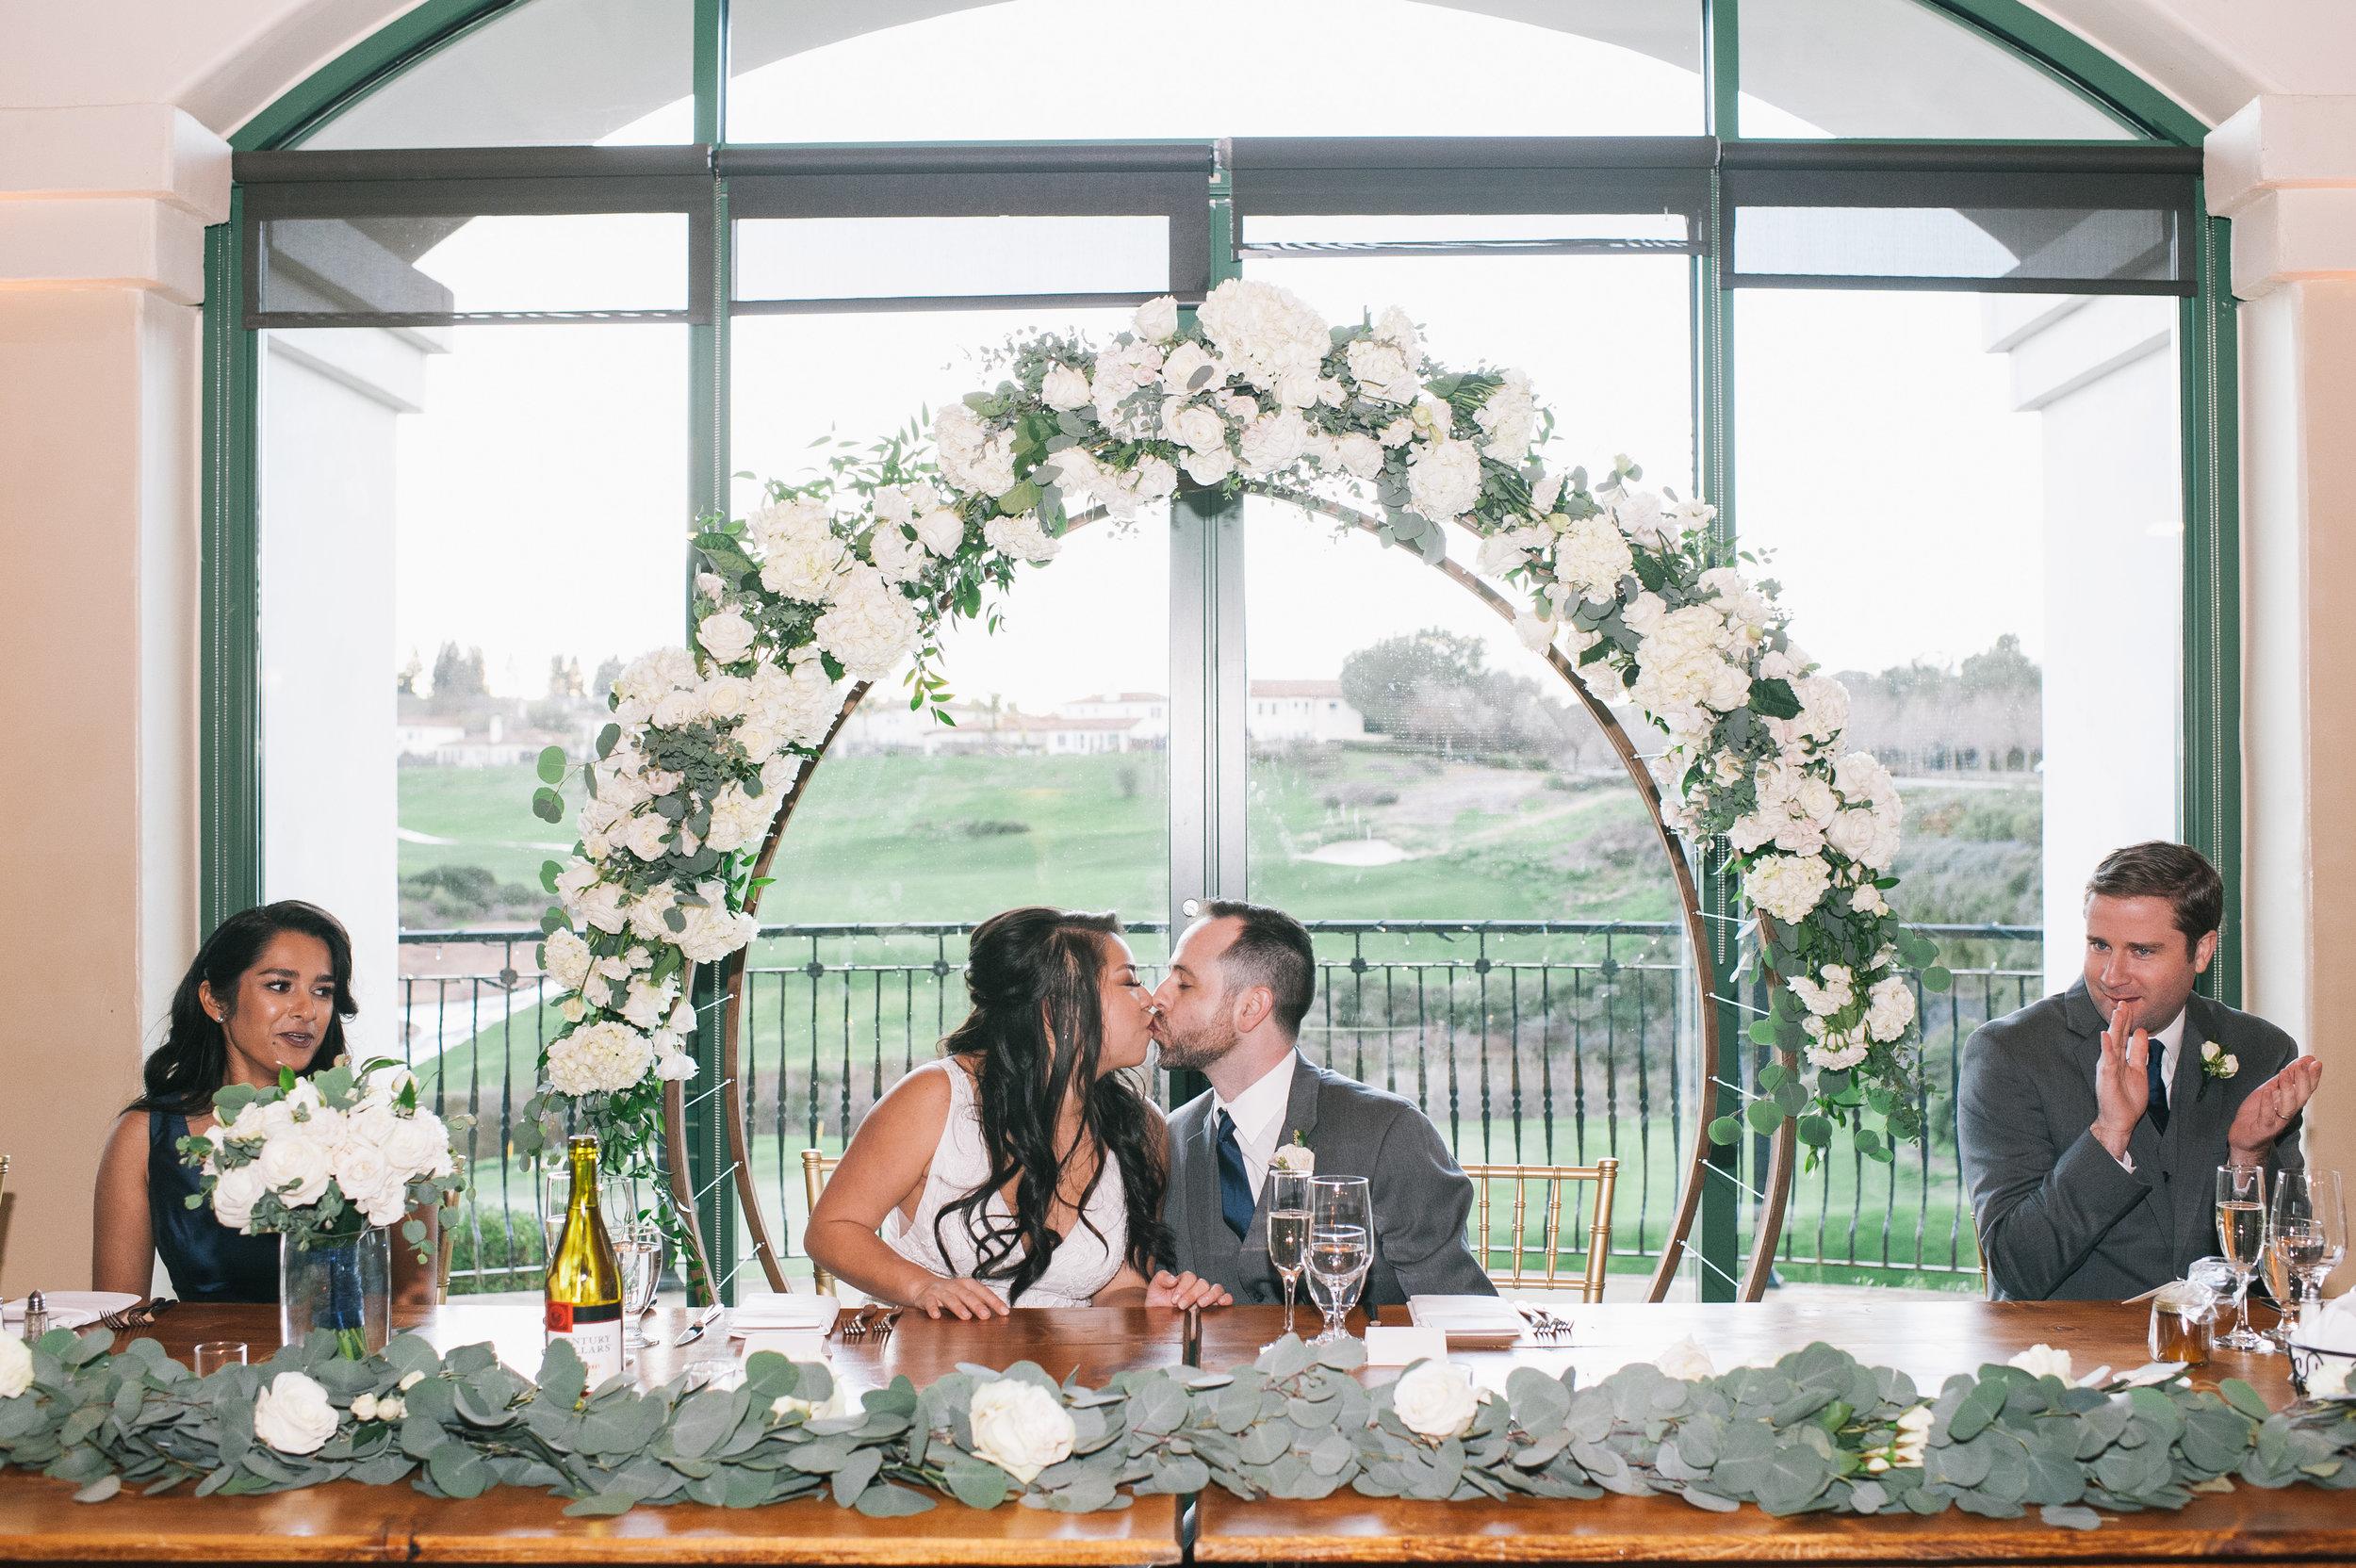 Emily Raul Wedding 20190216-822.jpg